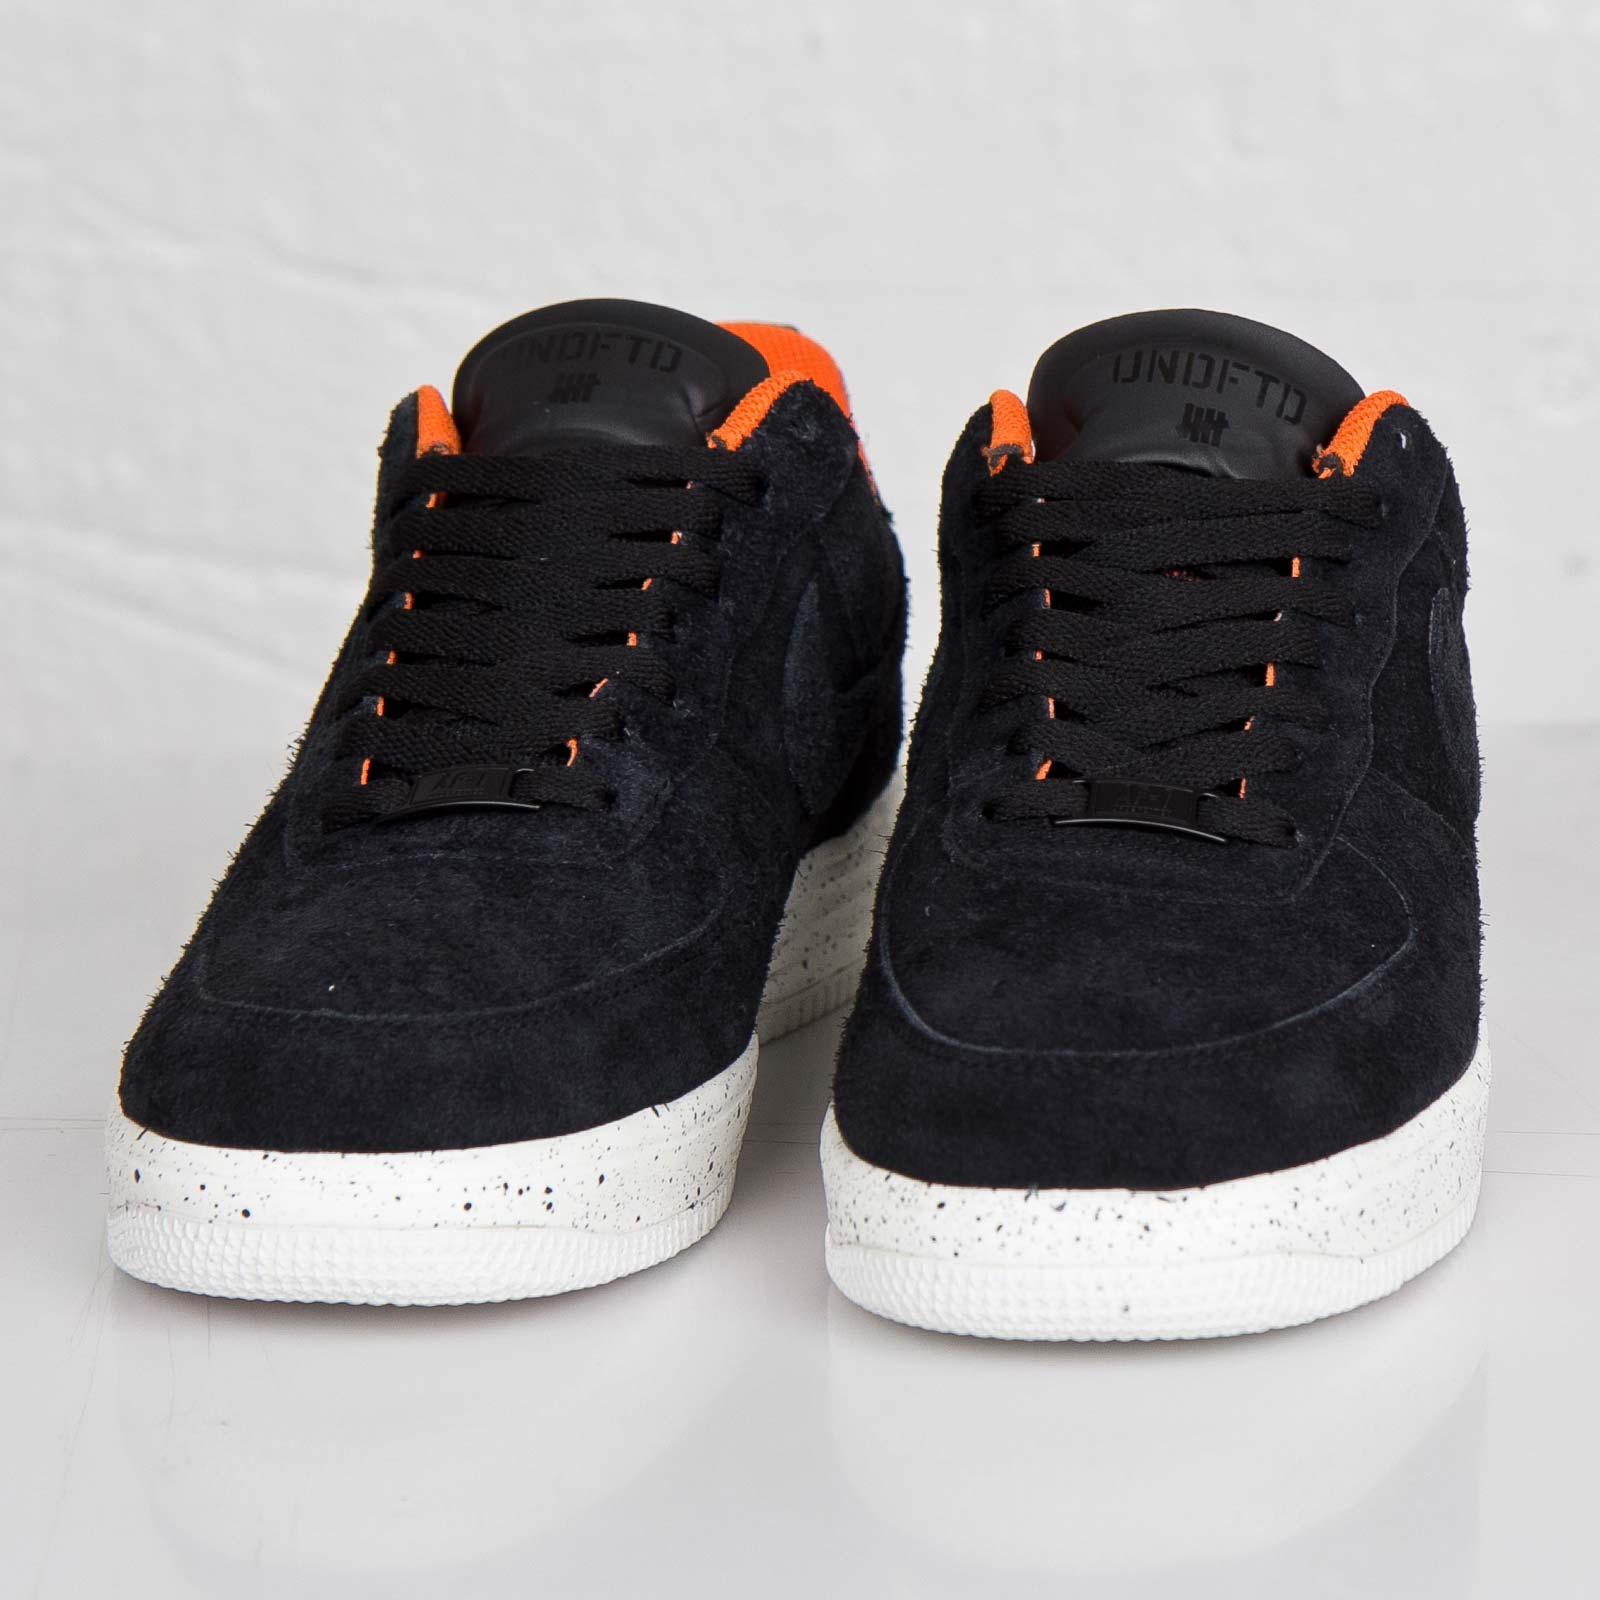 1 001 Sneakersnstuff Force Lunar Sp Undftd Nike 652805 QdCerWoxB